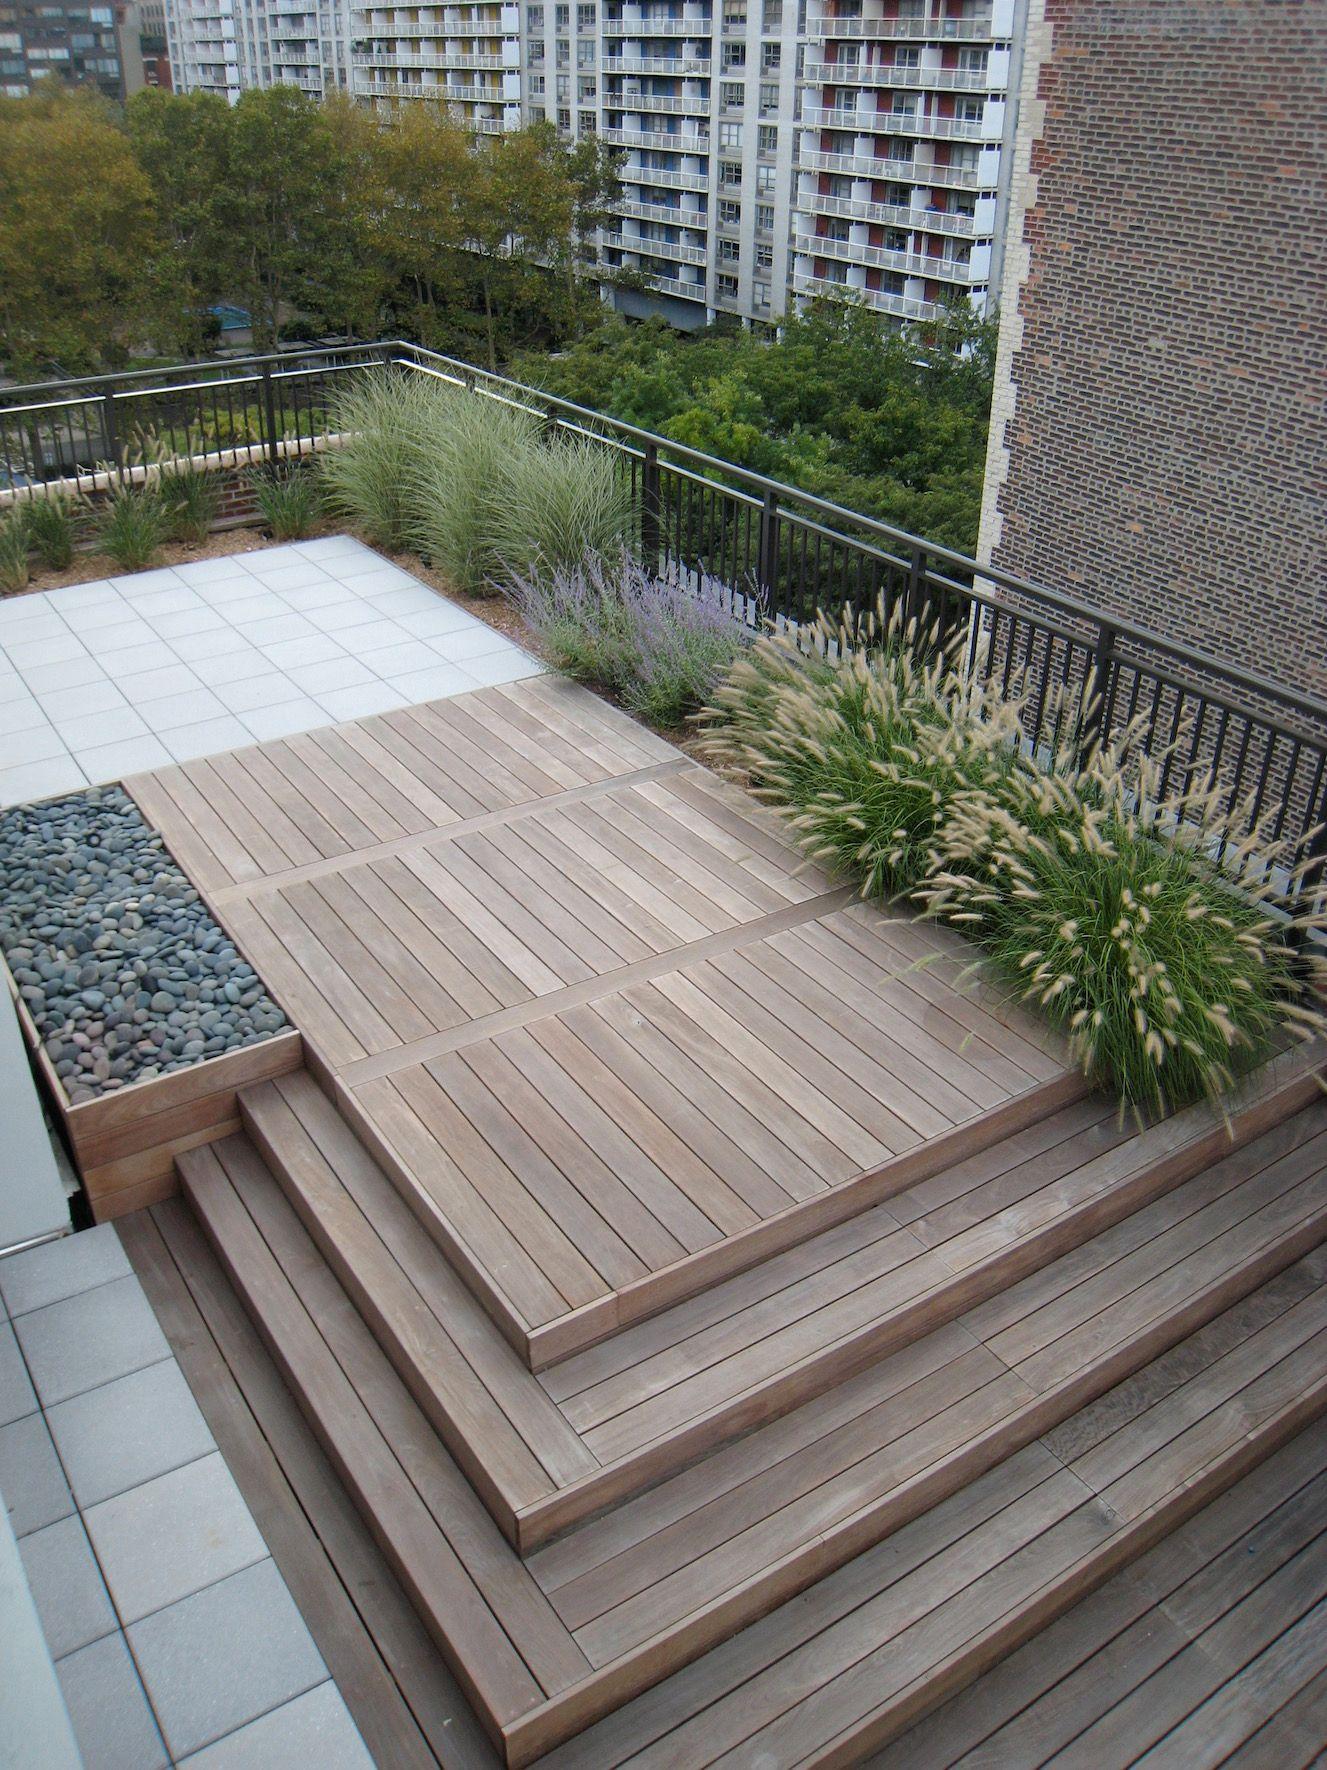 LaGuardia Place Roof Garden